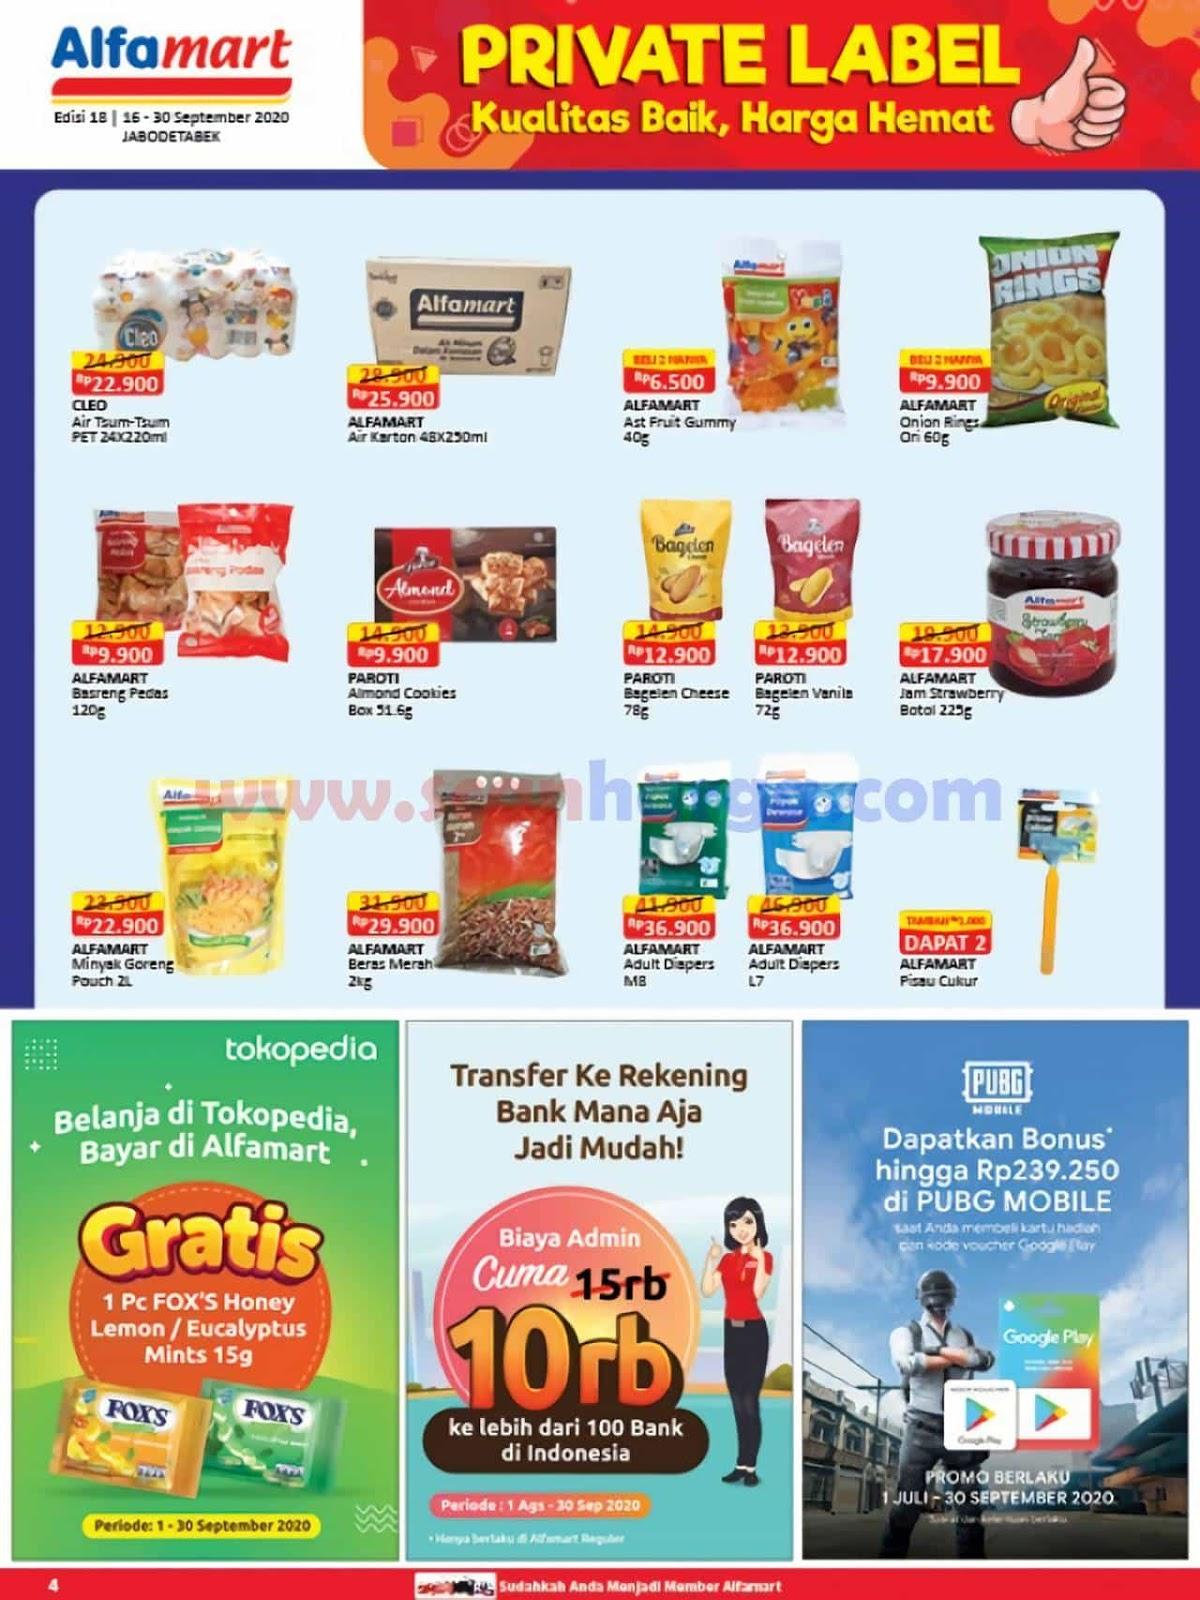 Katalog Promo Alfamart 16 - 30 September 2020 4